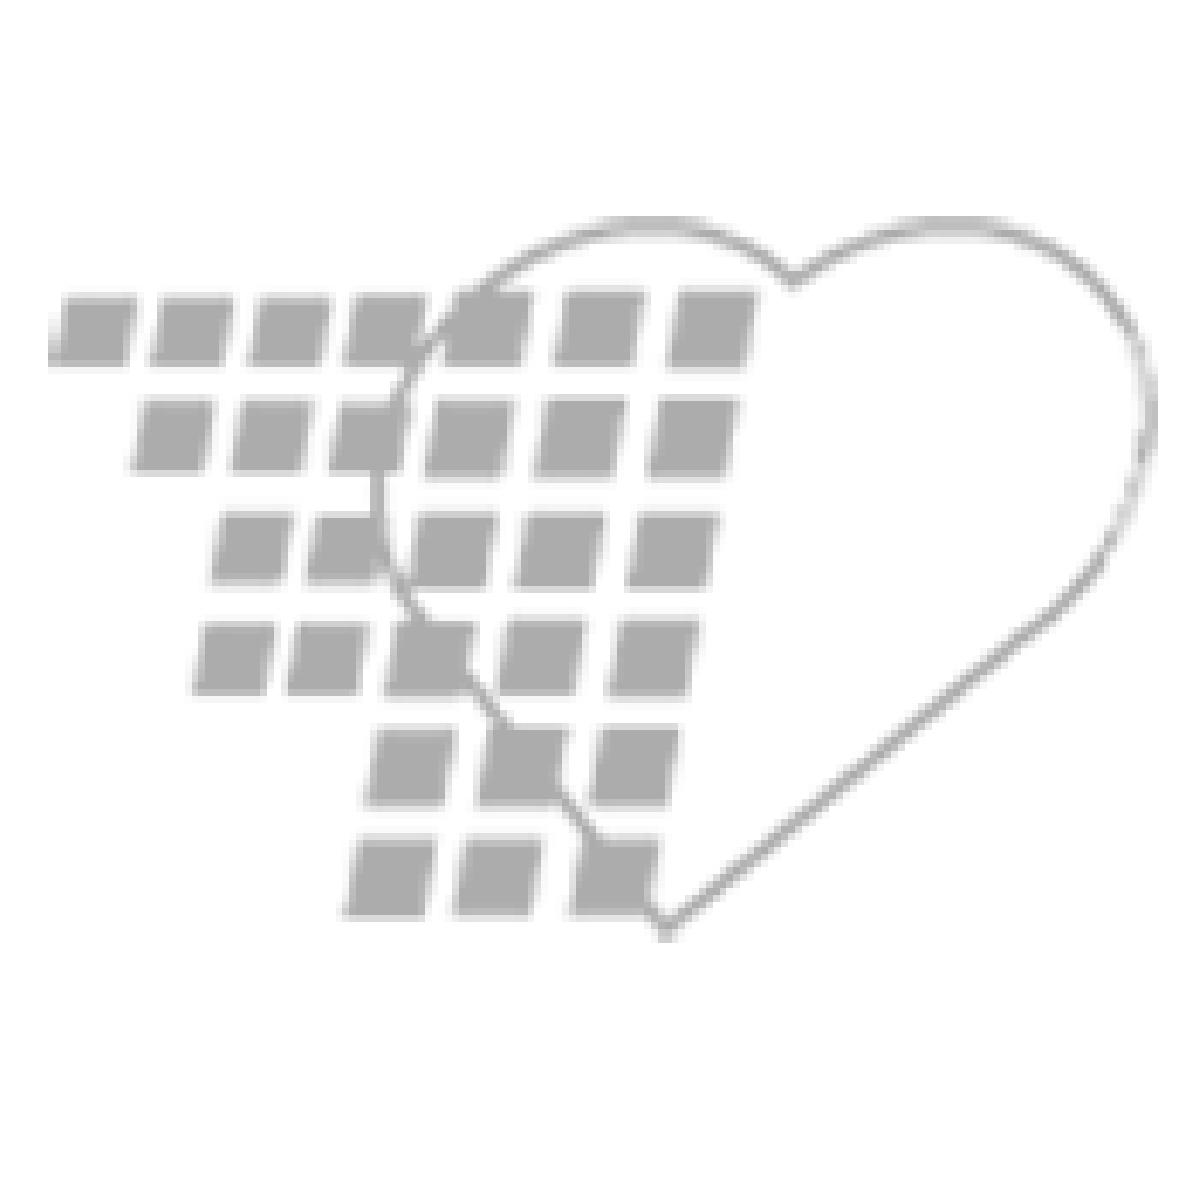 05-44-0010 - Laerdal Stifneck® Select   Collar Adult